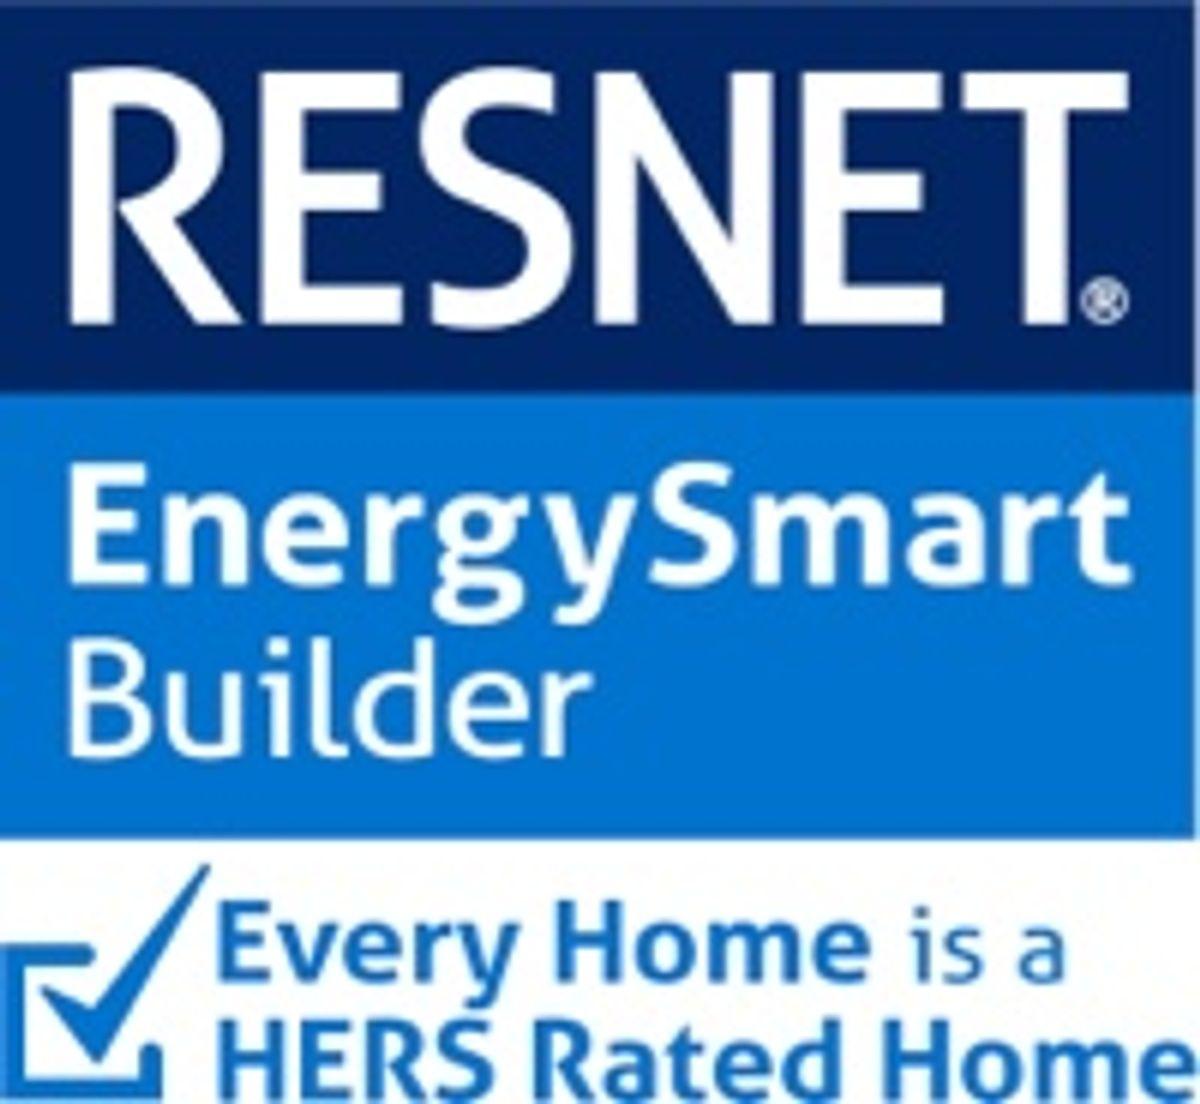 Logo from https://www.resnet.us